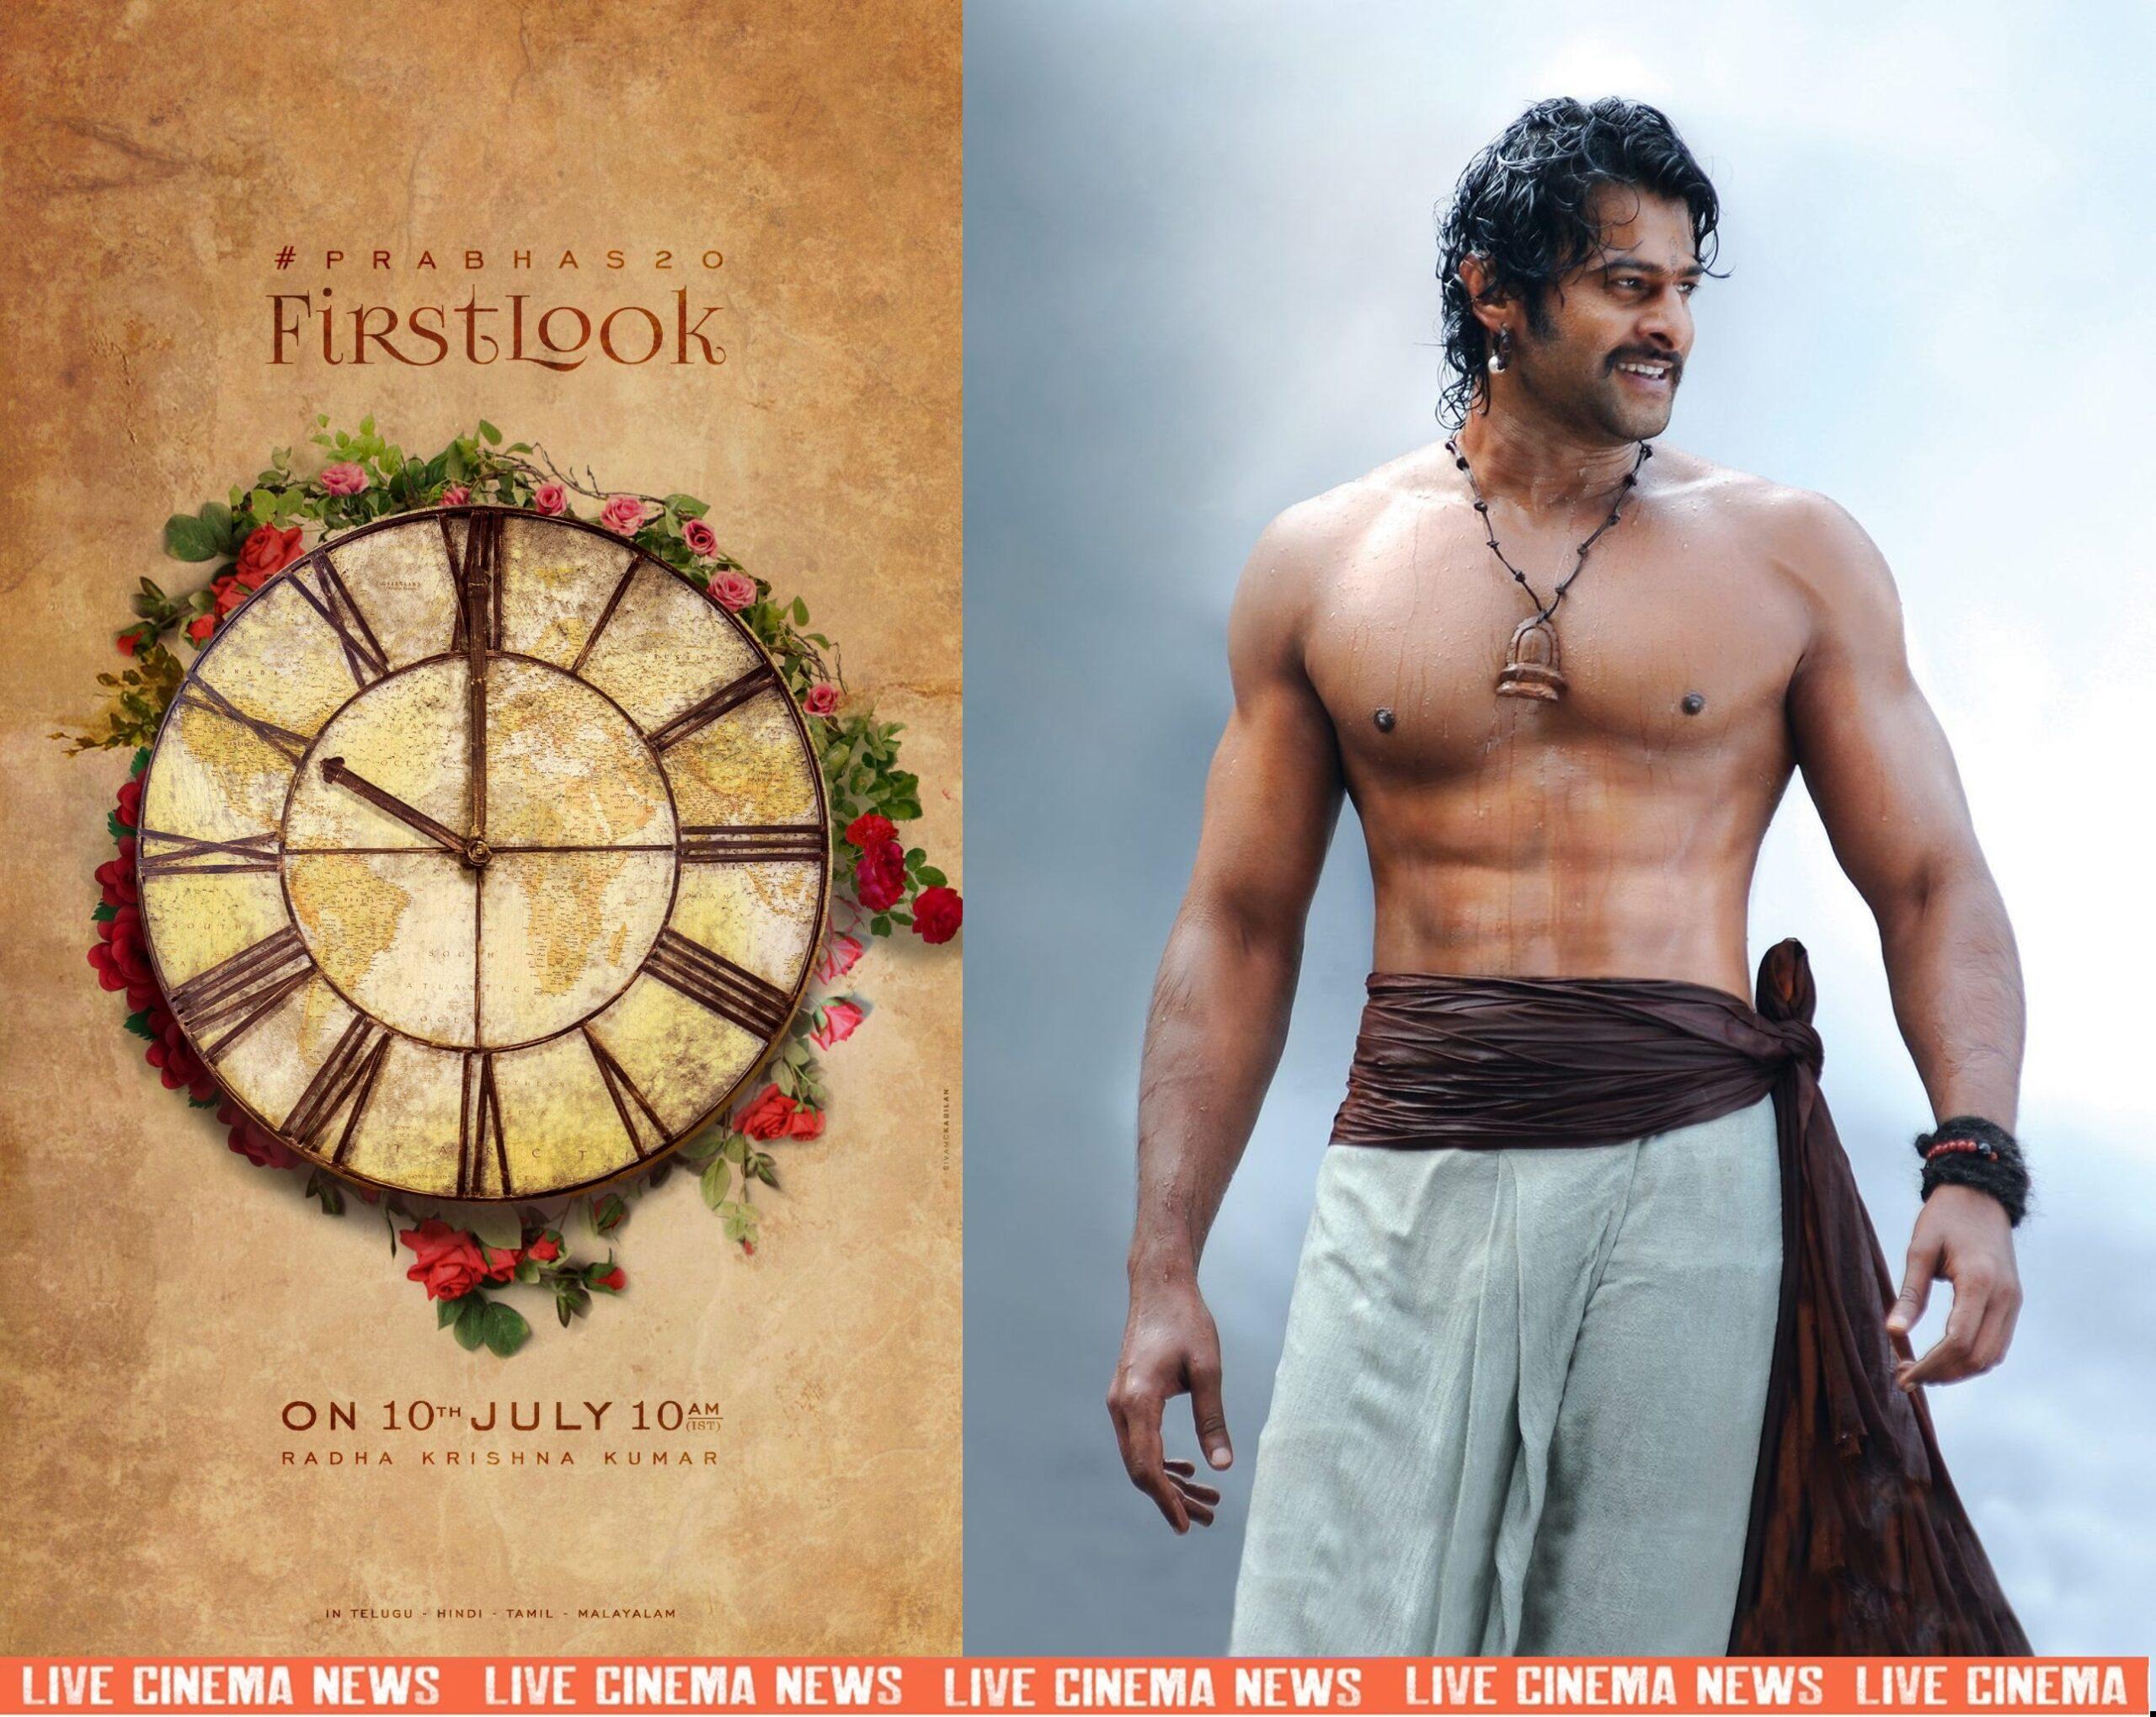 Prabhas 20th film firstlook announcement